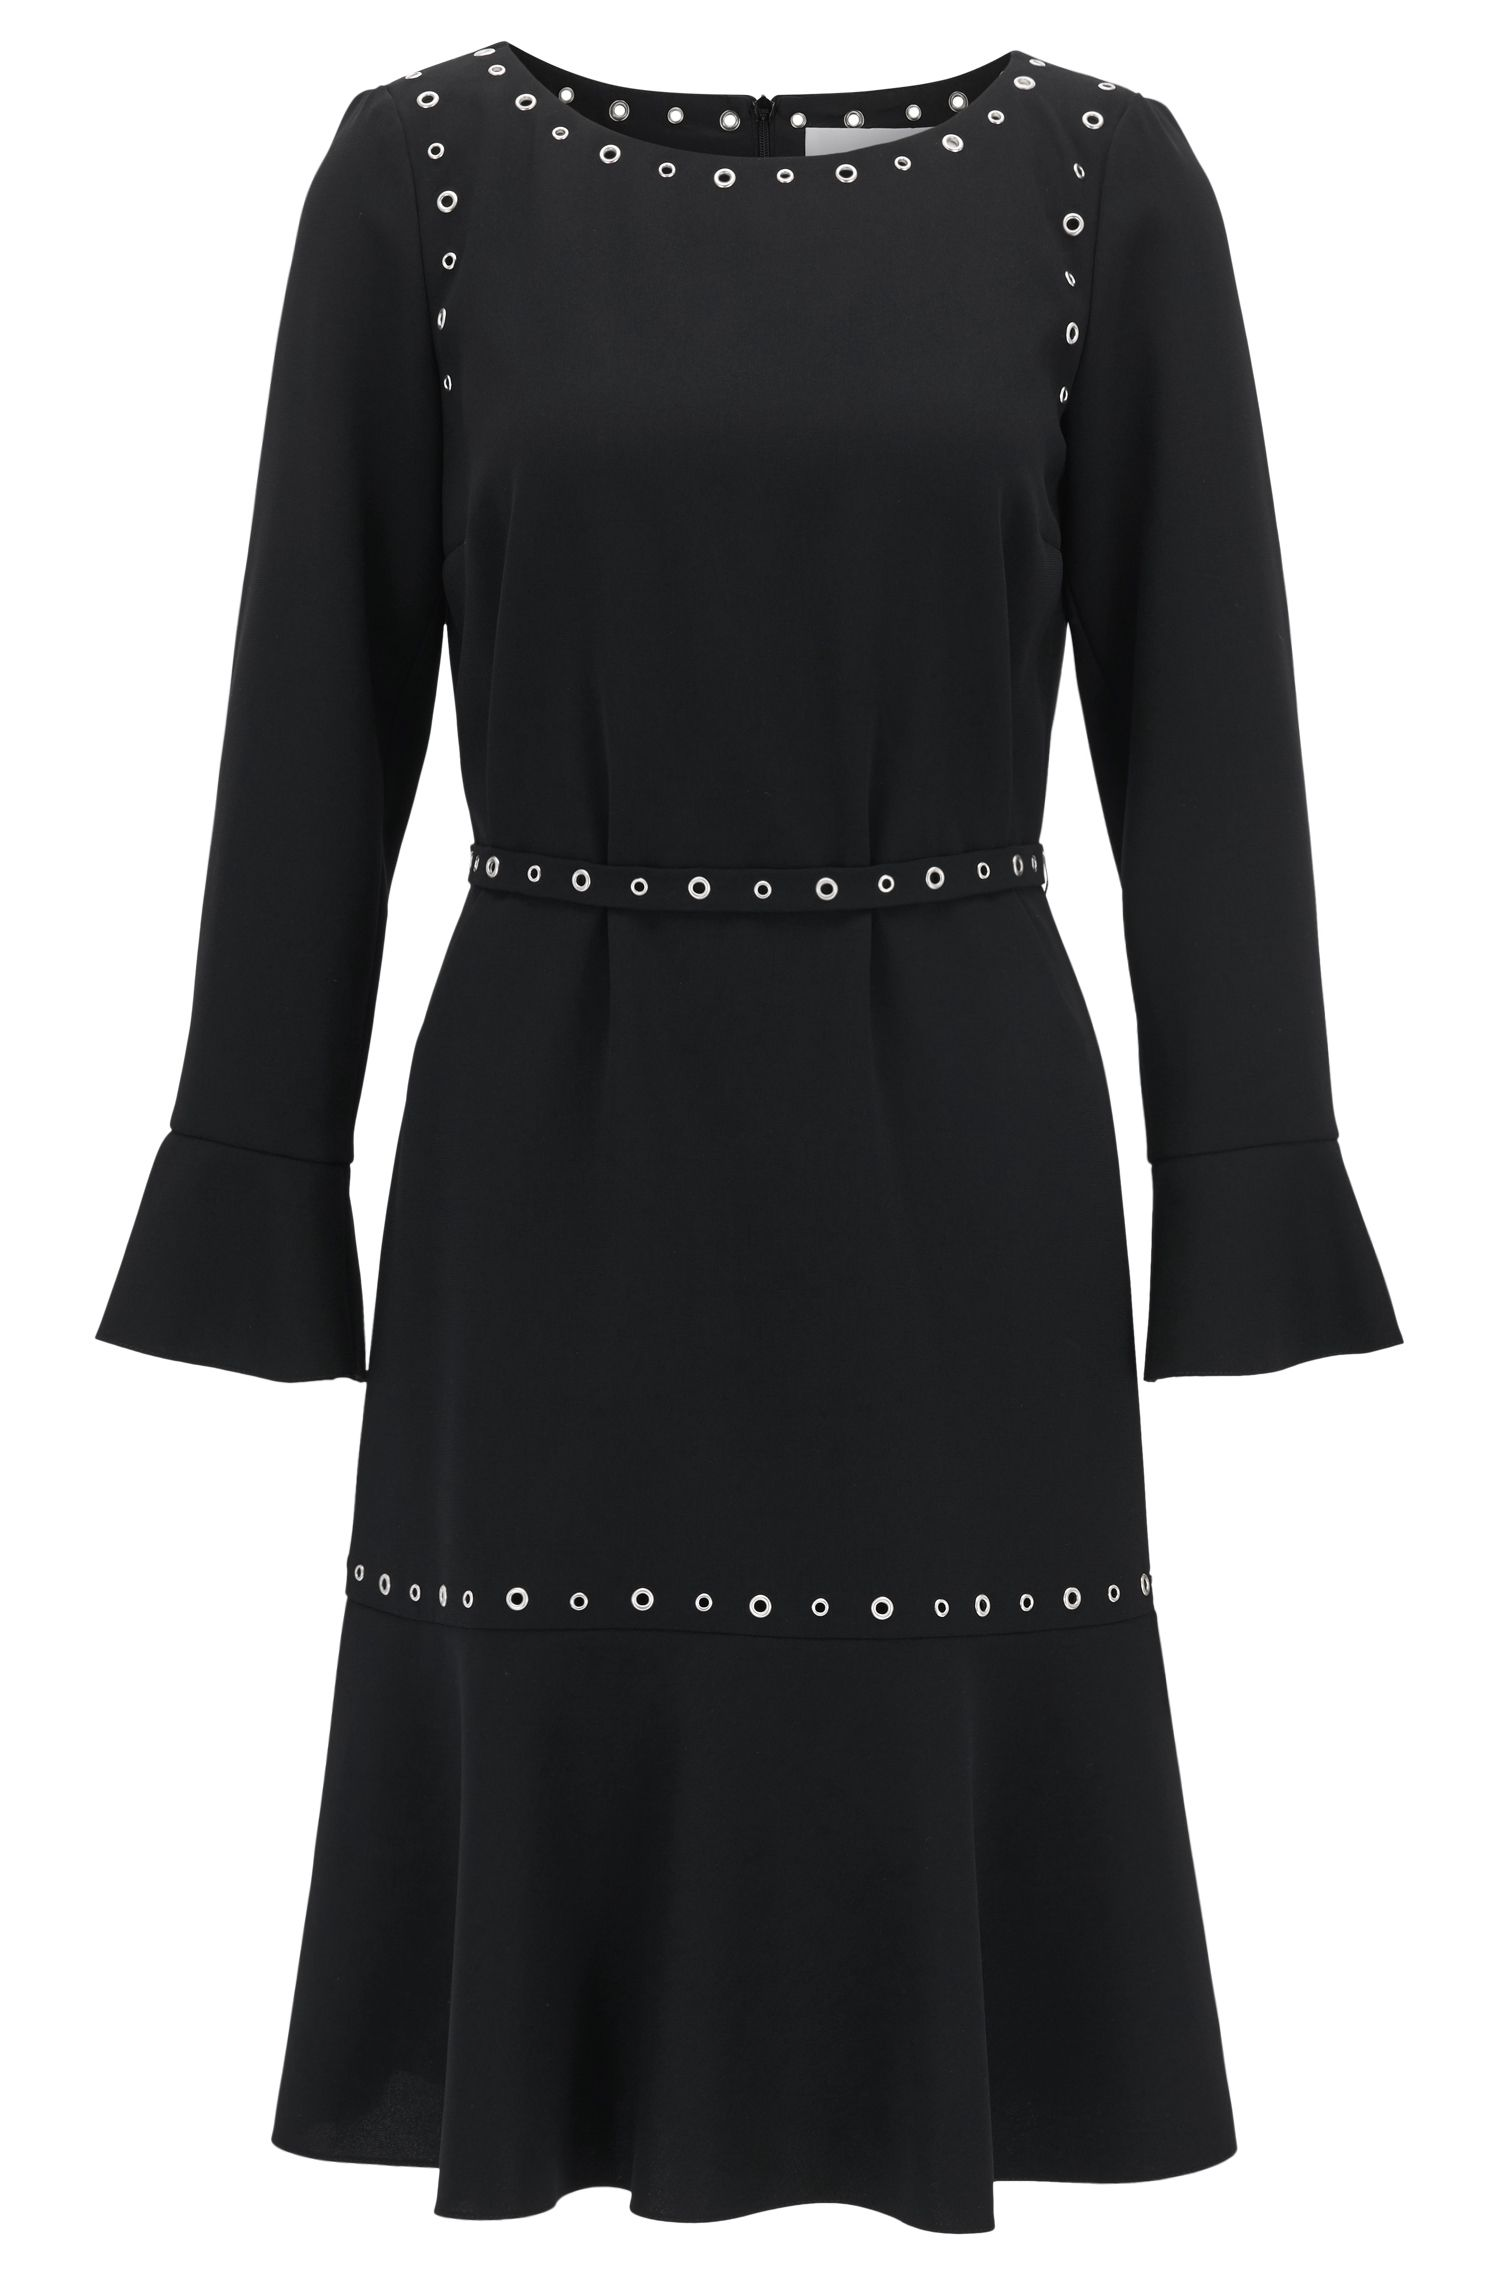 Langarm-Kleid aus Krepp mit Metall-Details